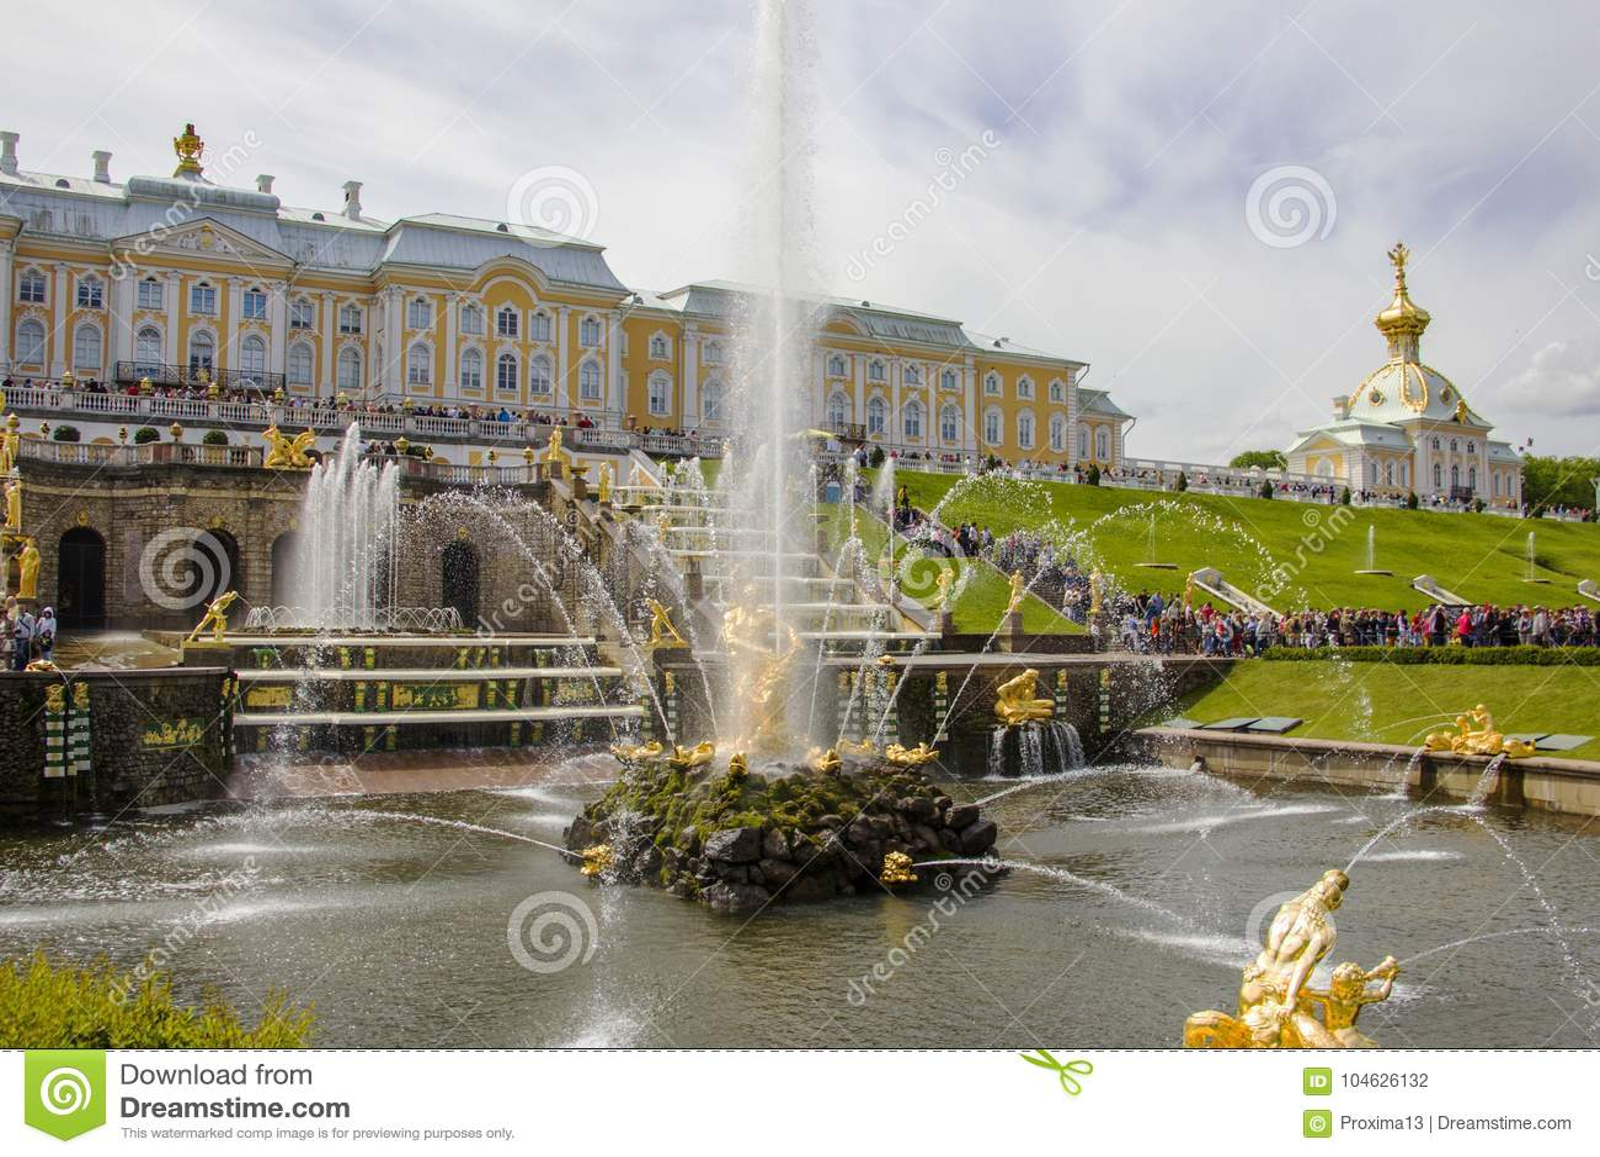 Download Grote Paleis, Fonteinen En Cascades In Peterhof Redactionele Fotografie - Afbeelding bestaande uit palace, peter: 104626132